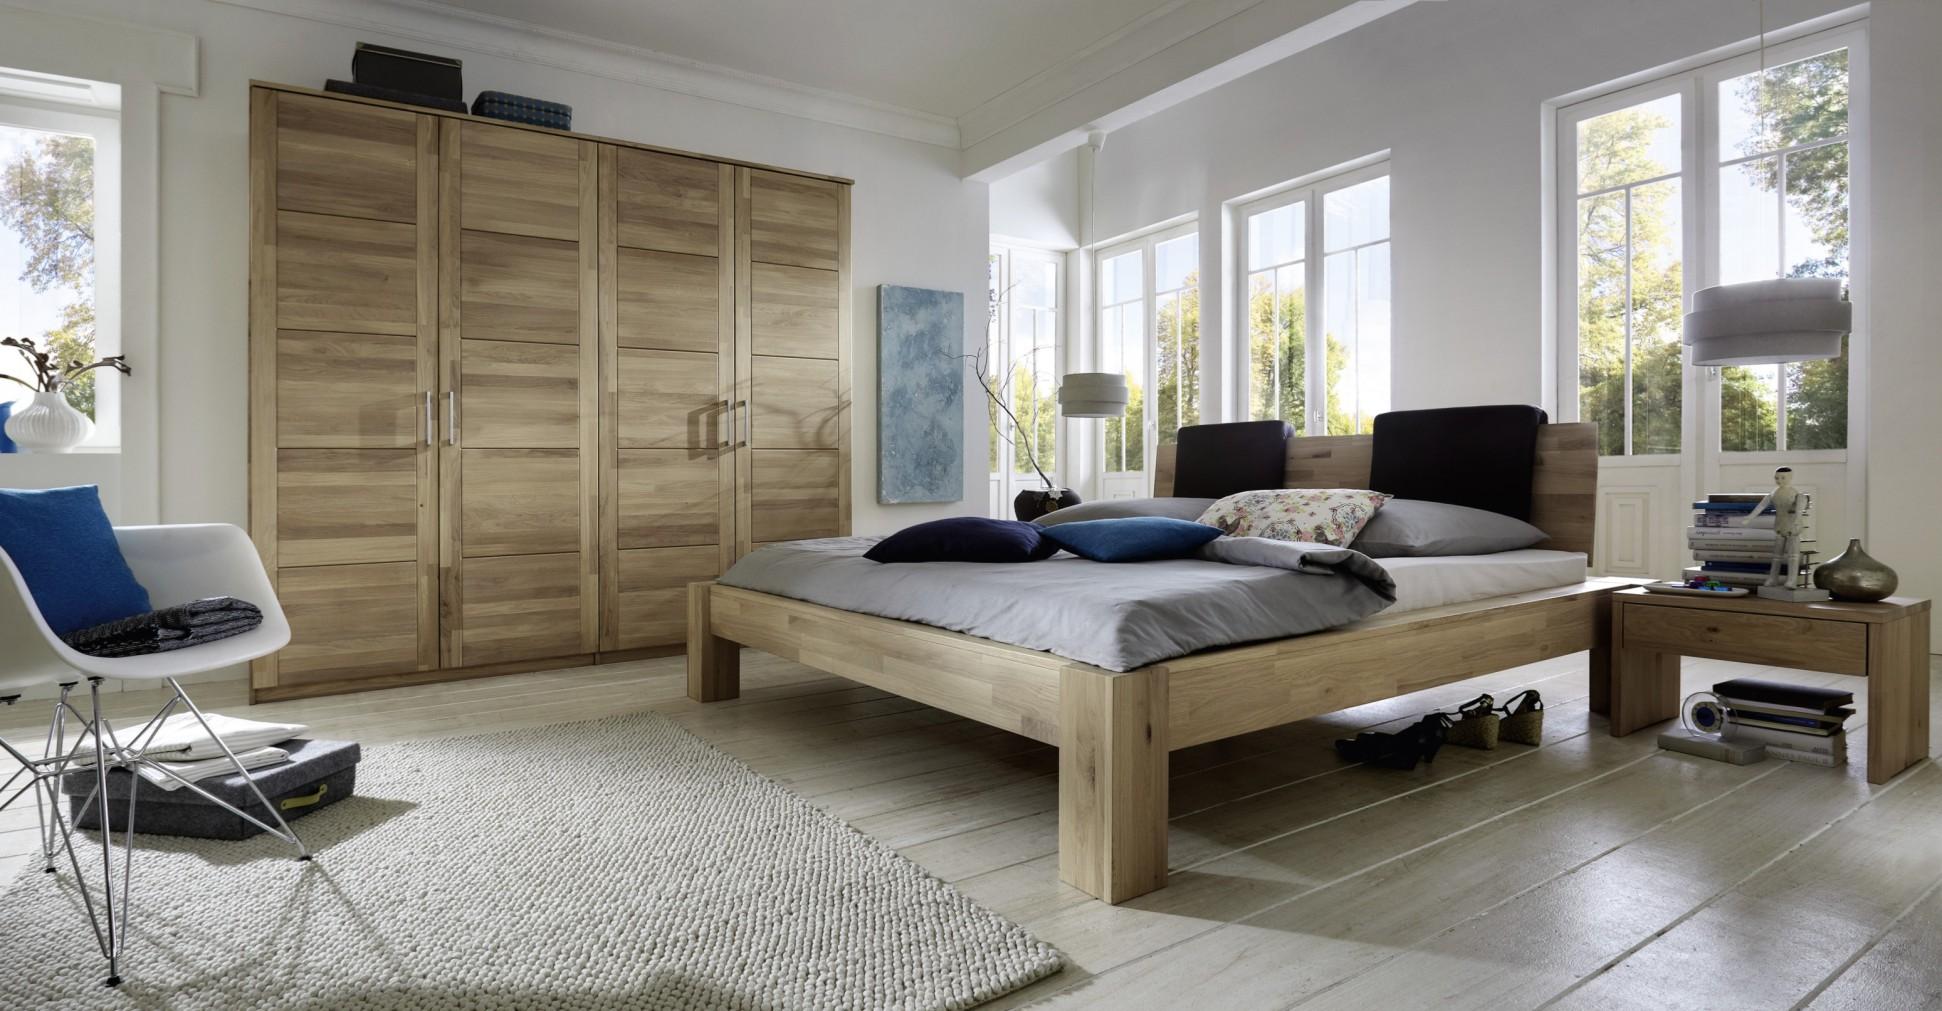 naturbelassene massivholzbetten massivholzschlafzimmer in schw bisch gm nd preisg ndtig. Black Bedroom Furniture Sets. Home Design Ideas